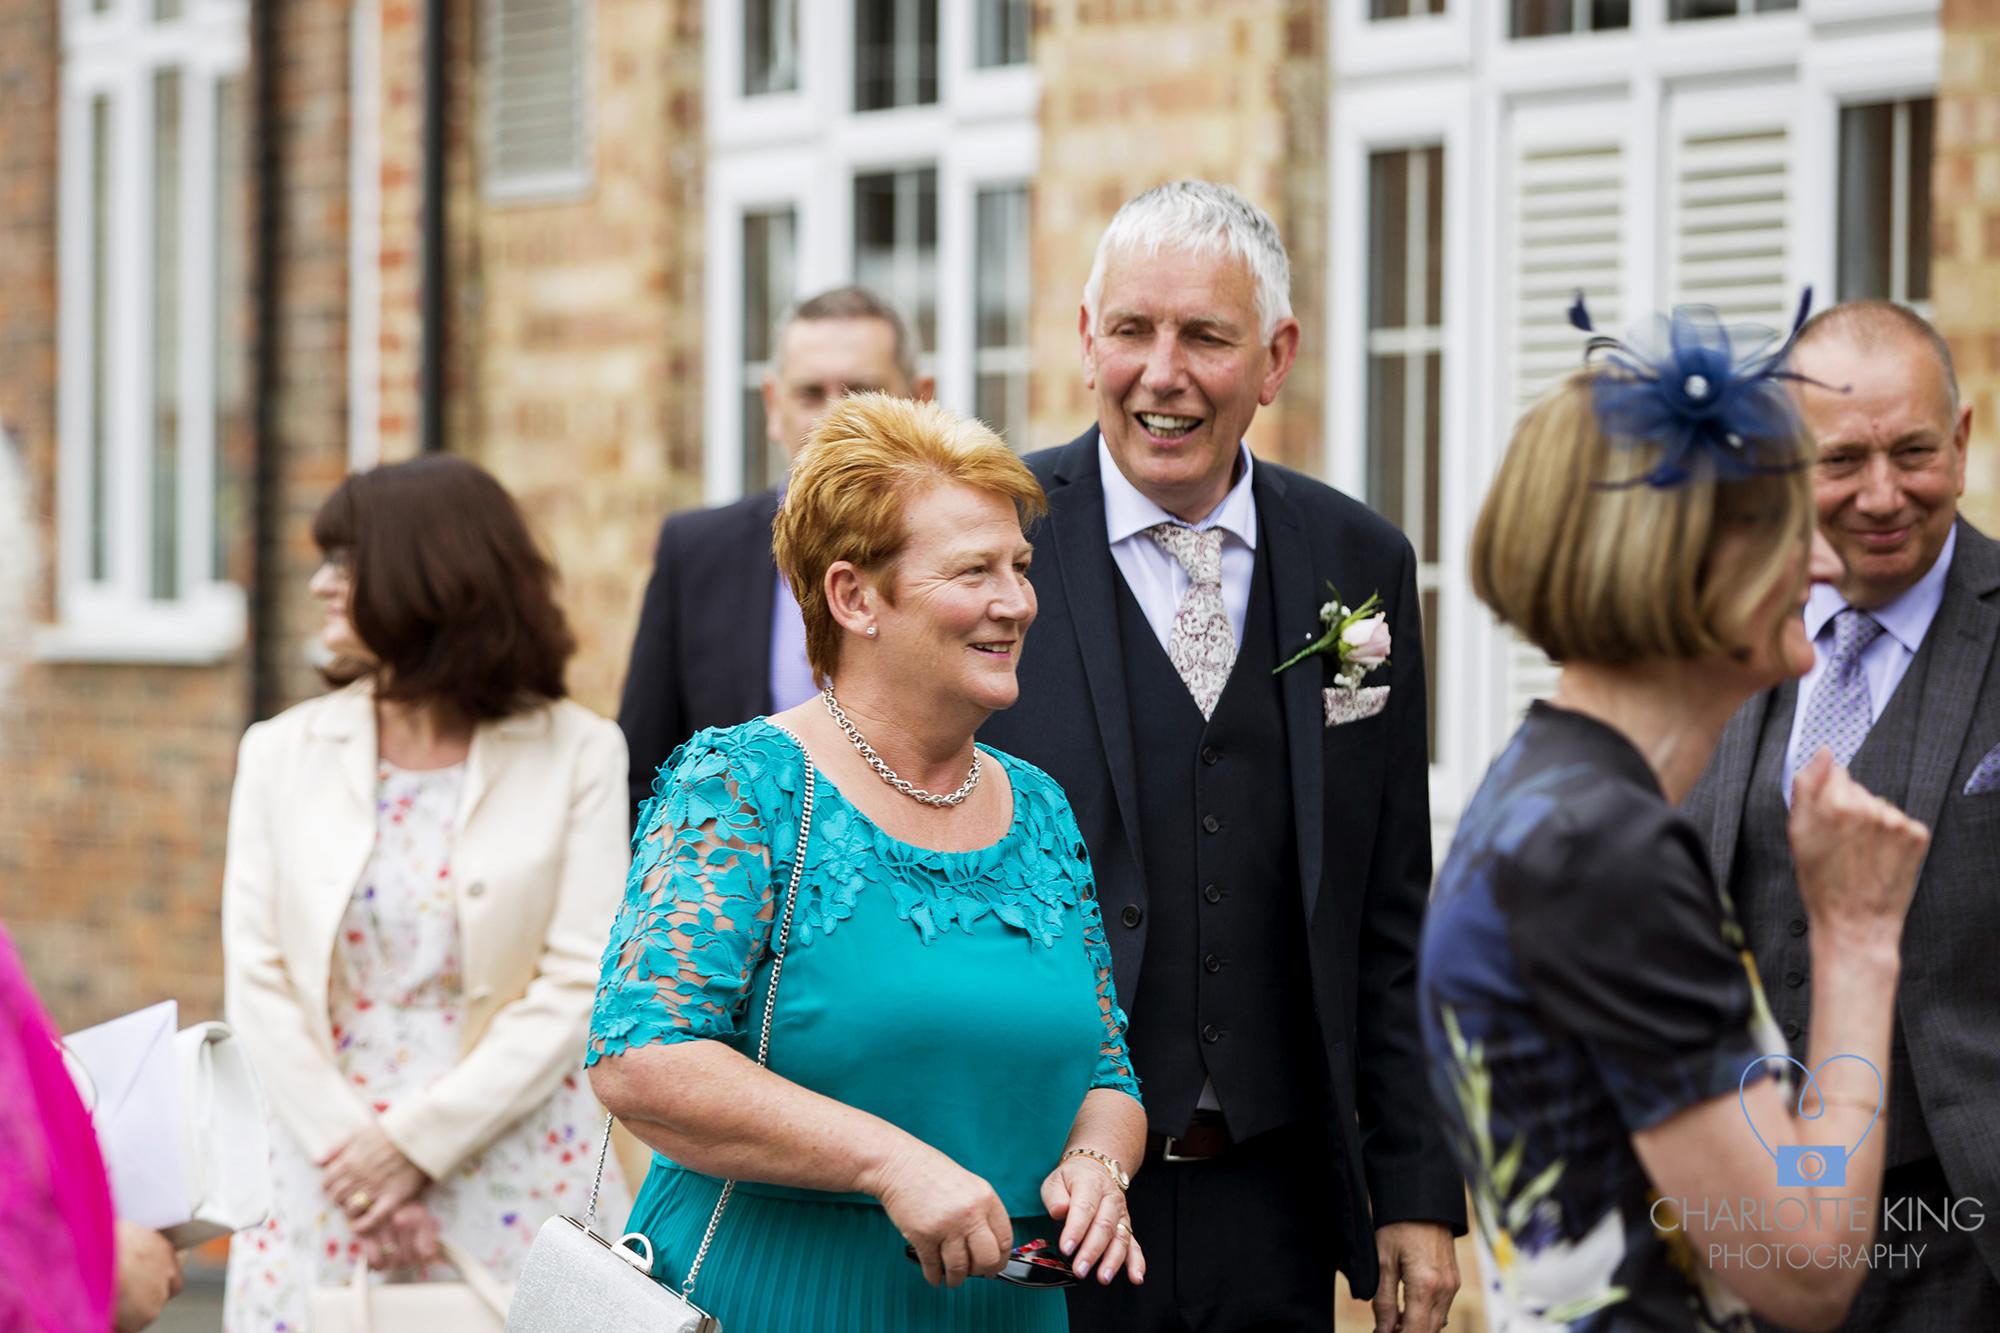 Woldingham-school-wedding-charlotte-king-photography (15)